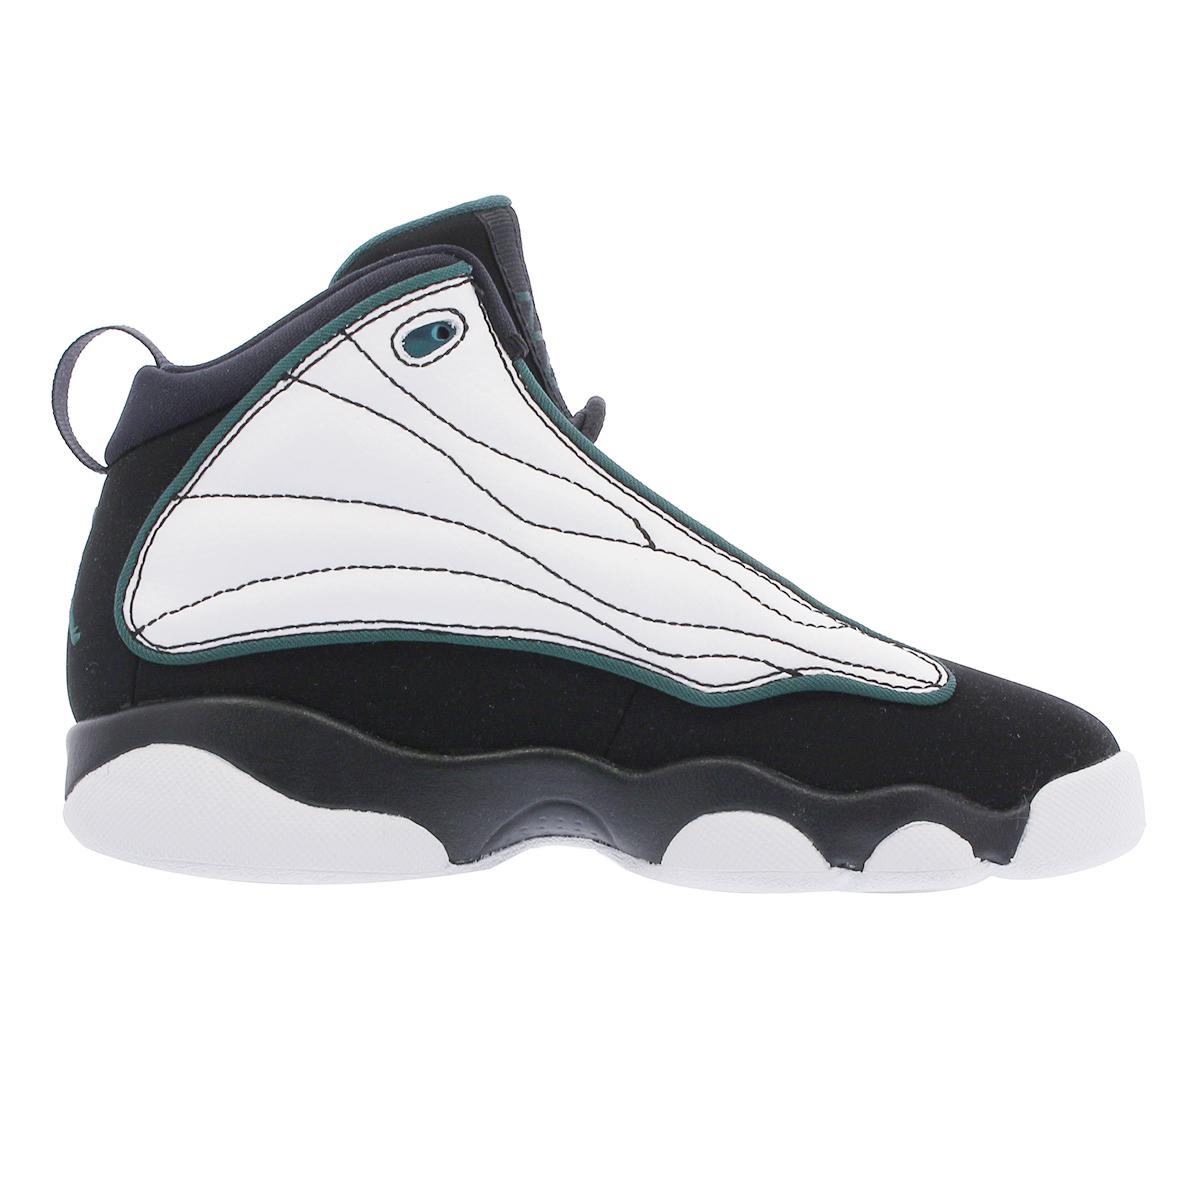 factory price a06b5 9c9ab ... NIKE JORDAN PRO STRONG PS Nike Air Jordan Prost long PS BLACK DARK PINE   ...